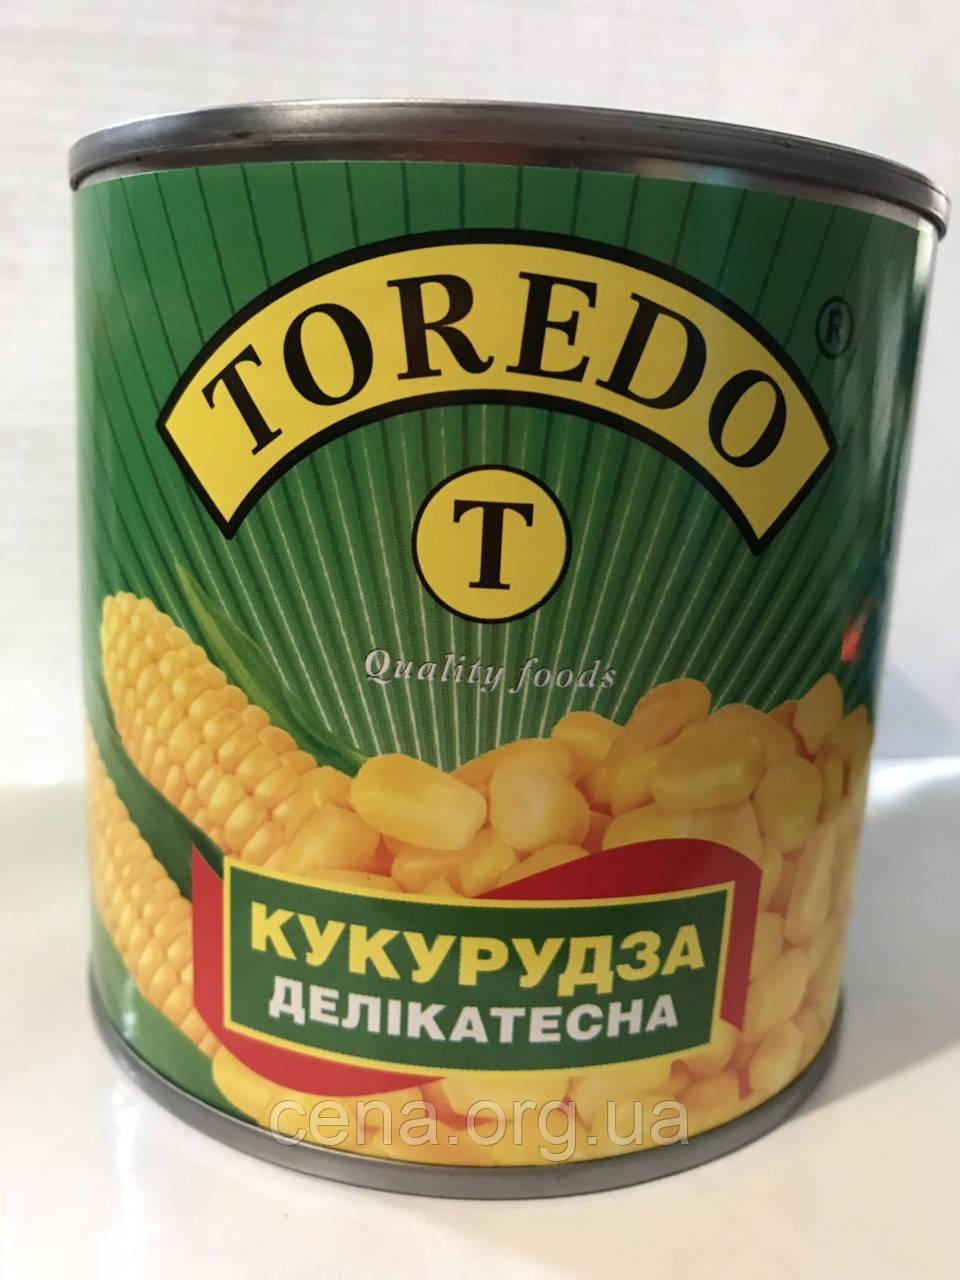 Кукуруза деликатесная Торедо (Toredo) 340г ж/б